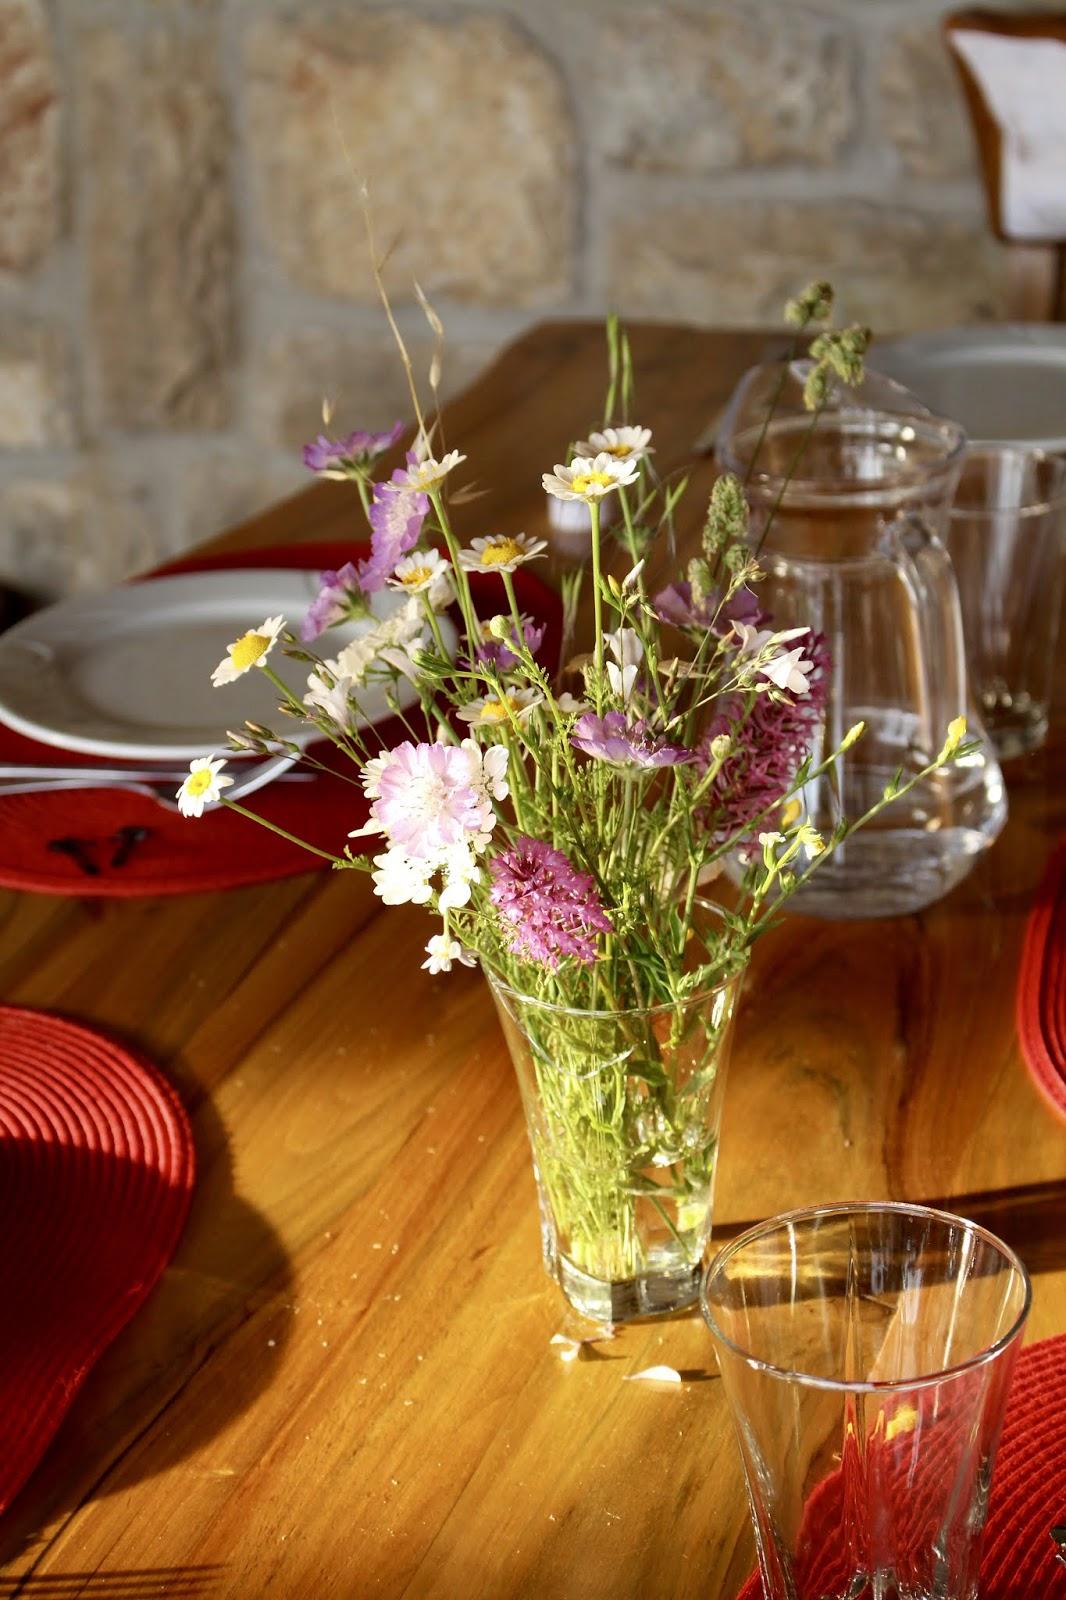 Kroatische Wiesenblumen